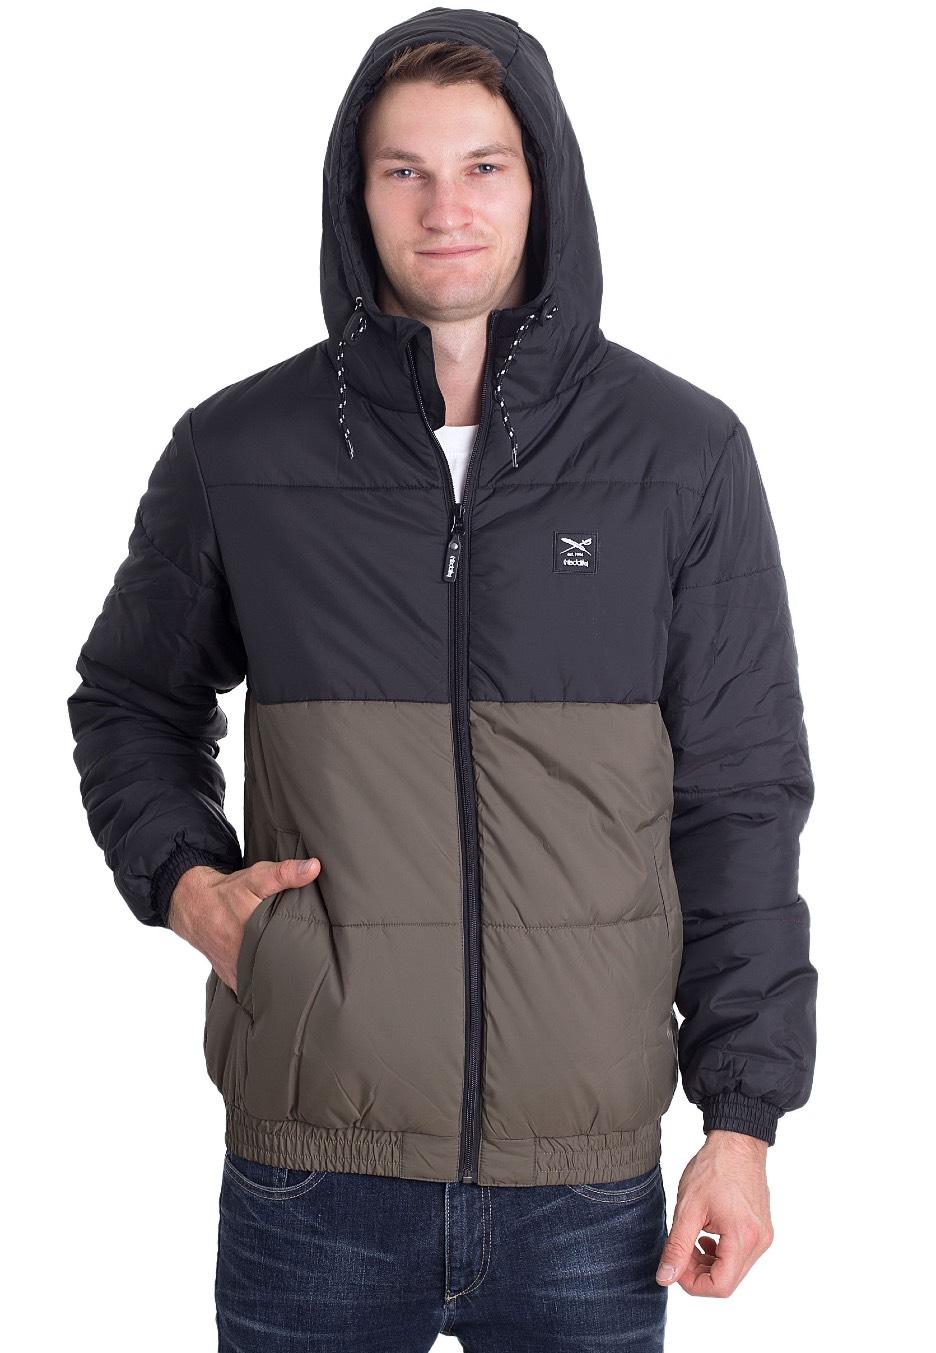 Streetwear Jacket BlackOlive Stagger Iriedaily Shop Hood ZIYqc1